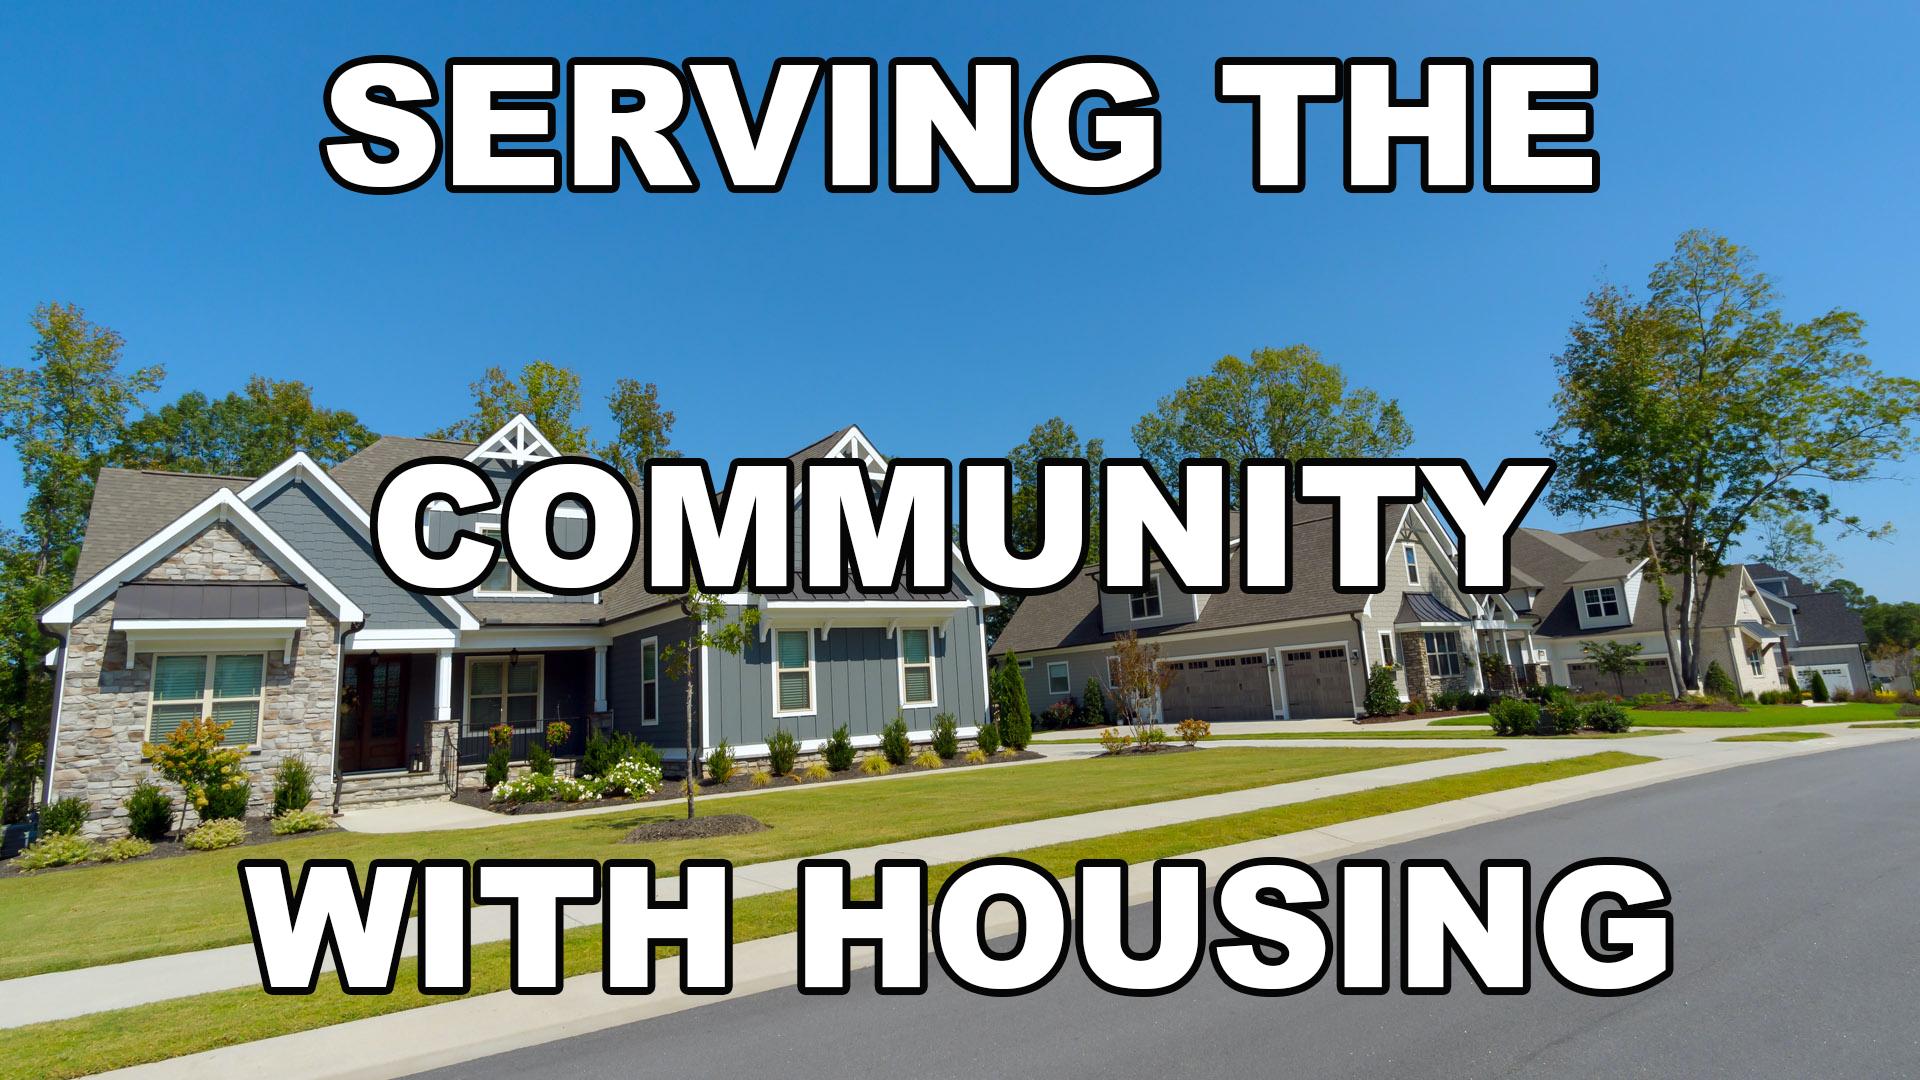 Housing Asheville: Better Living Through Homeward Bound